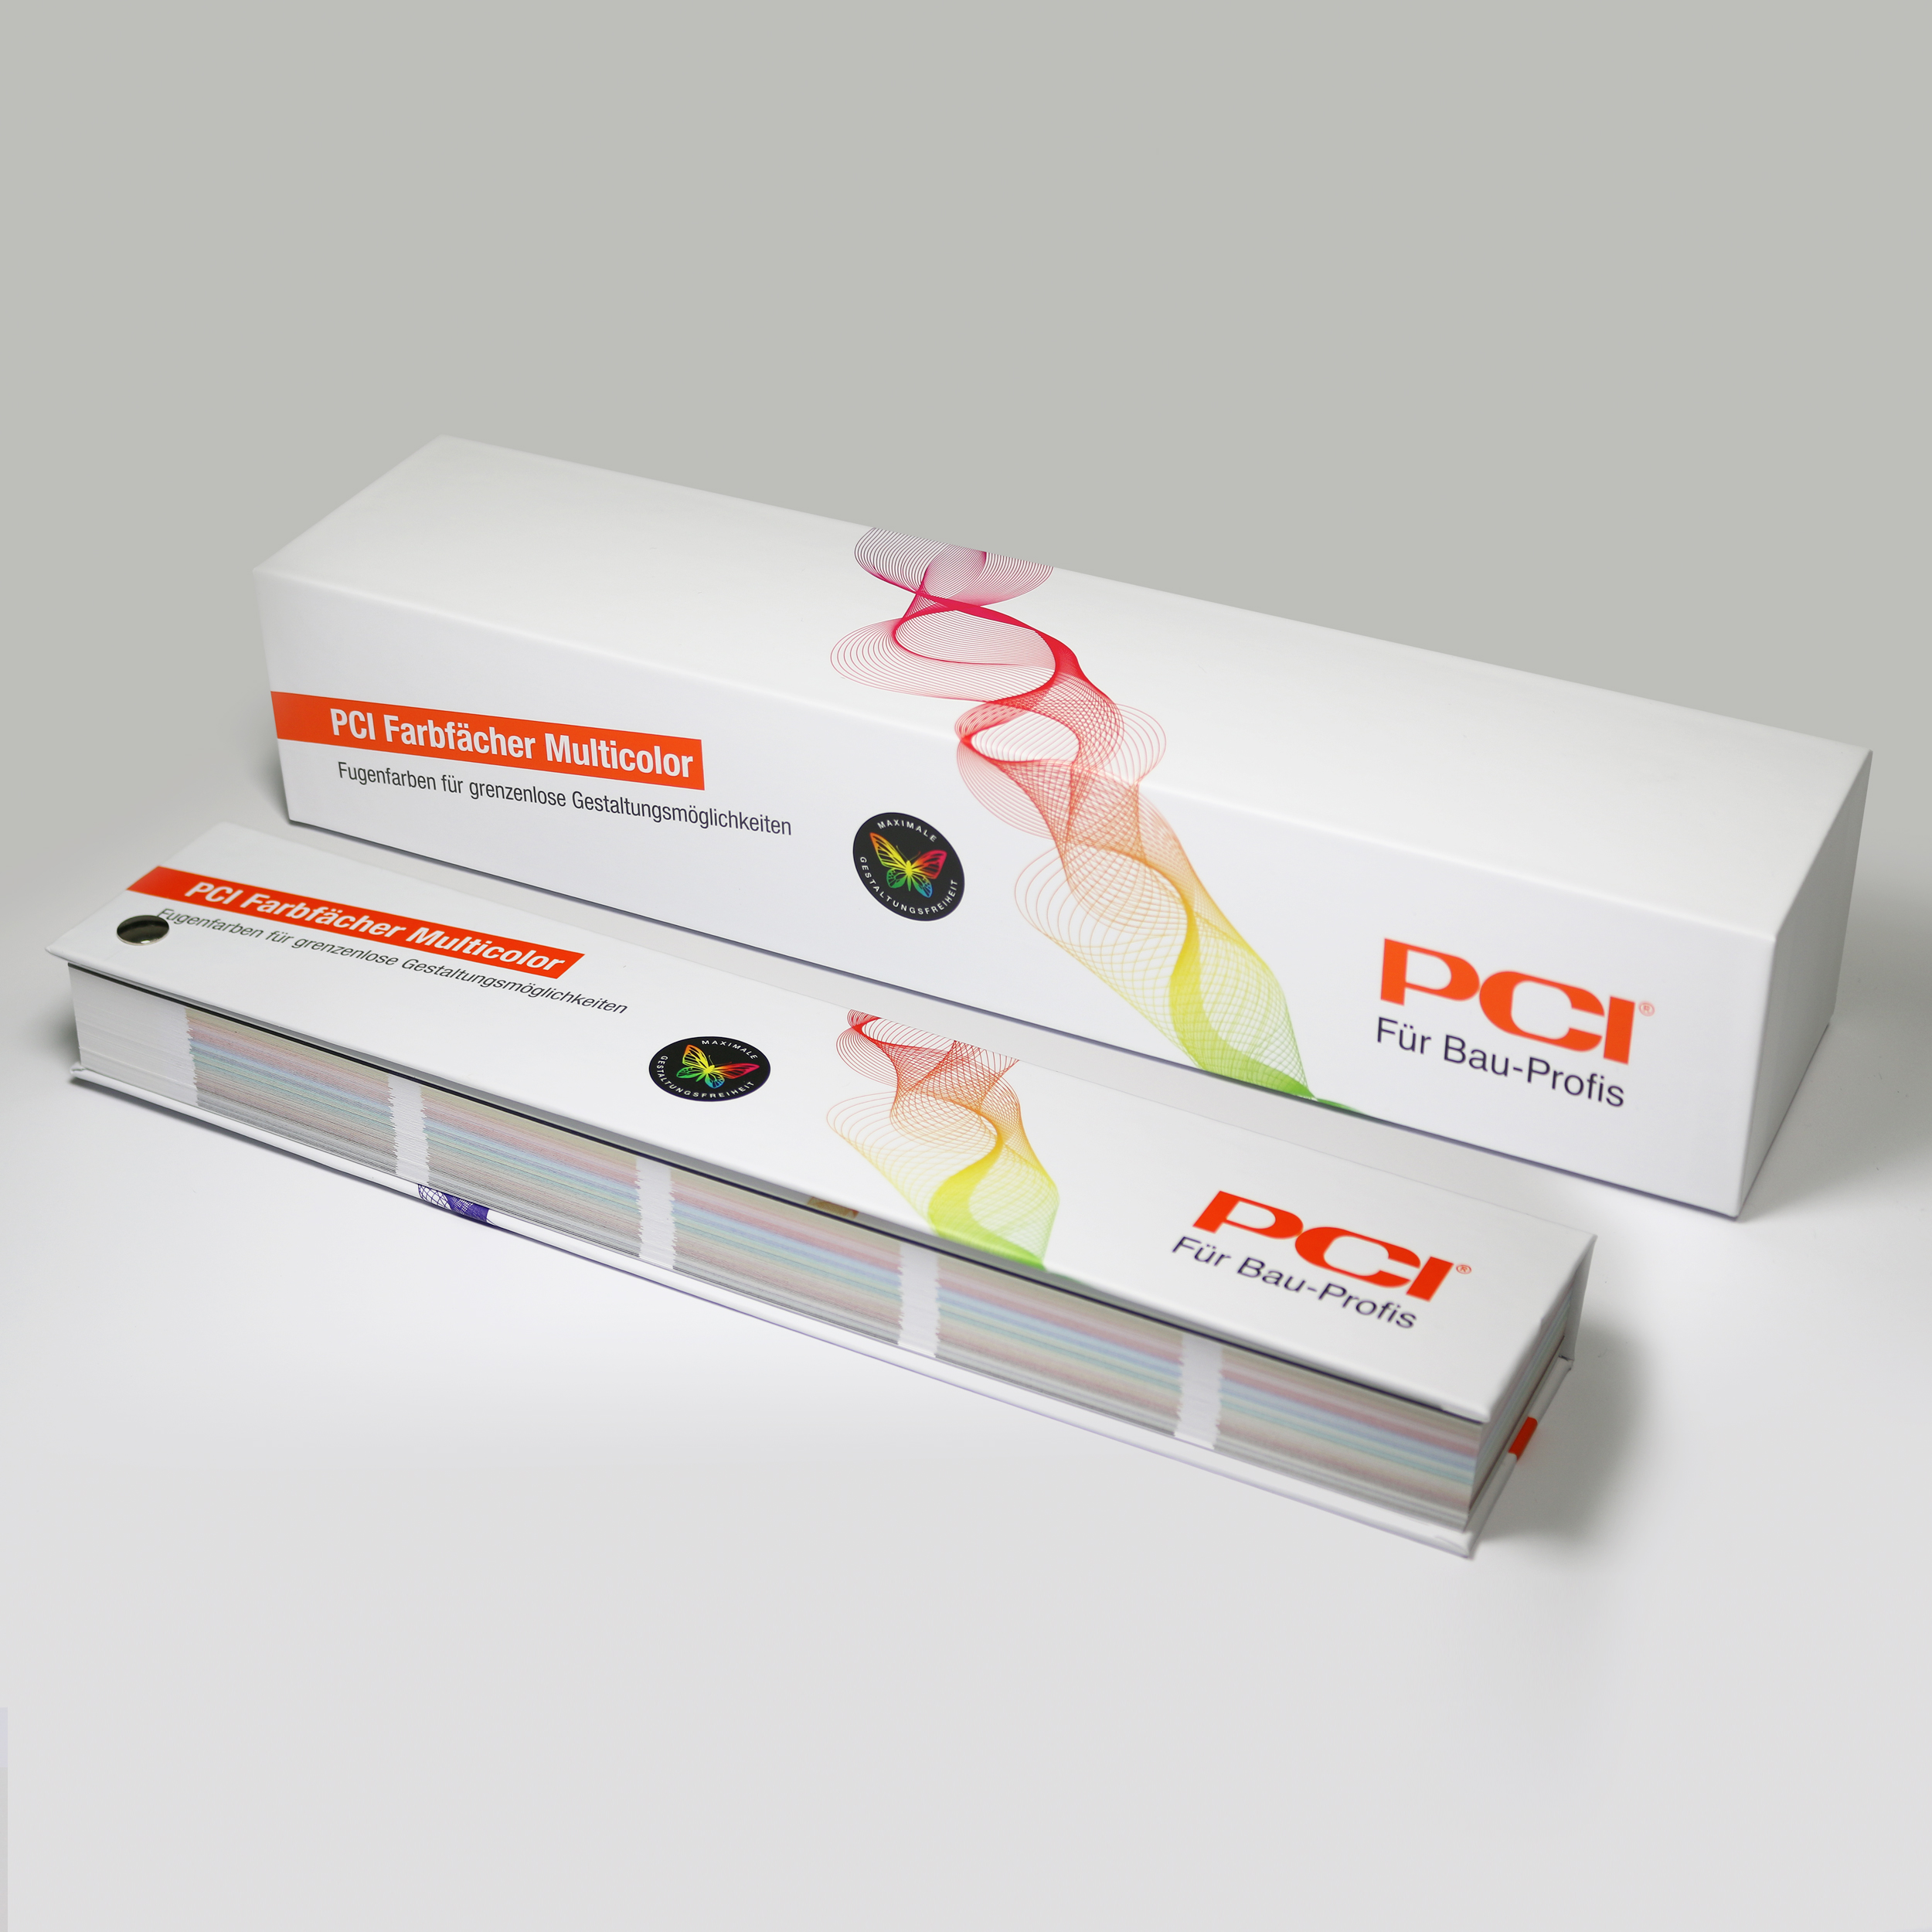 Farbfächer PCI Durapox Premium Multicolor